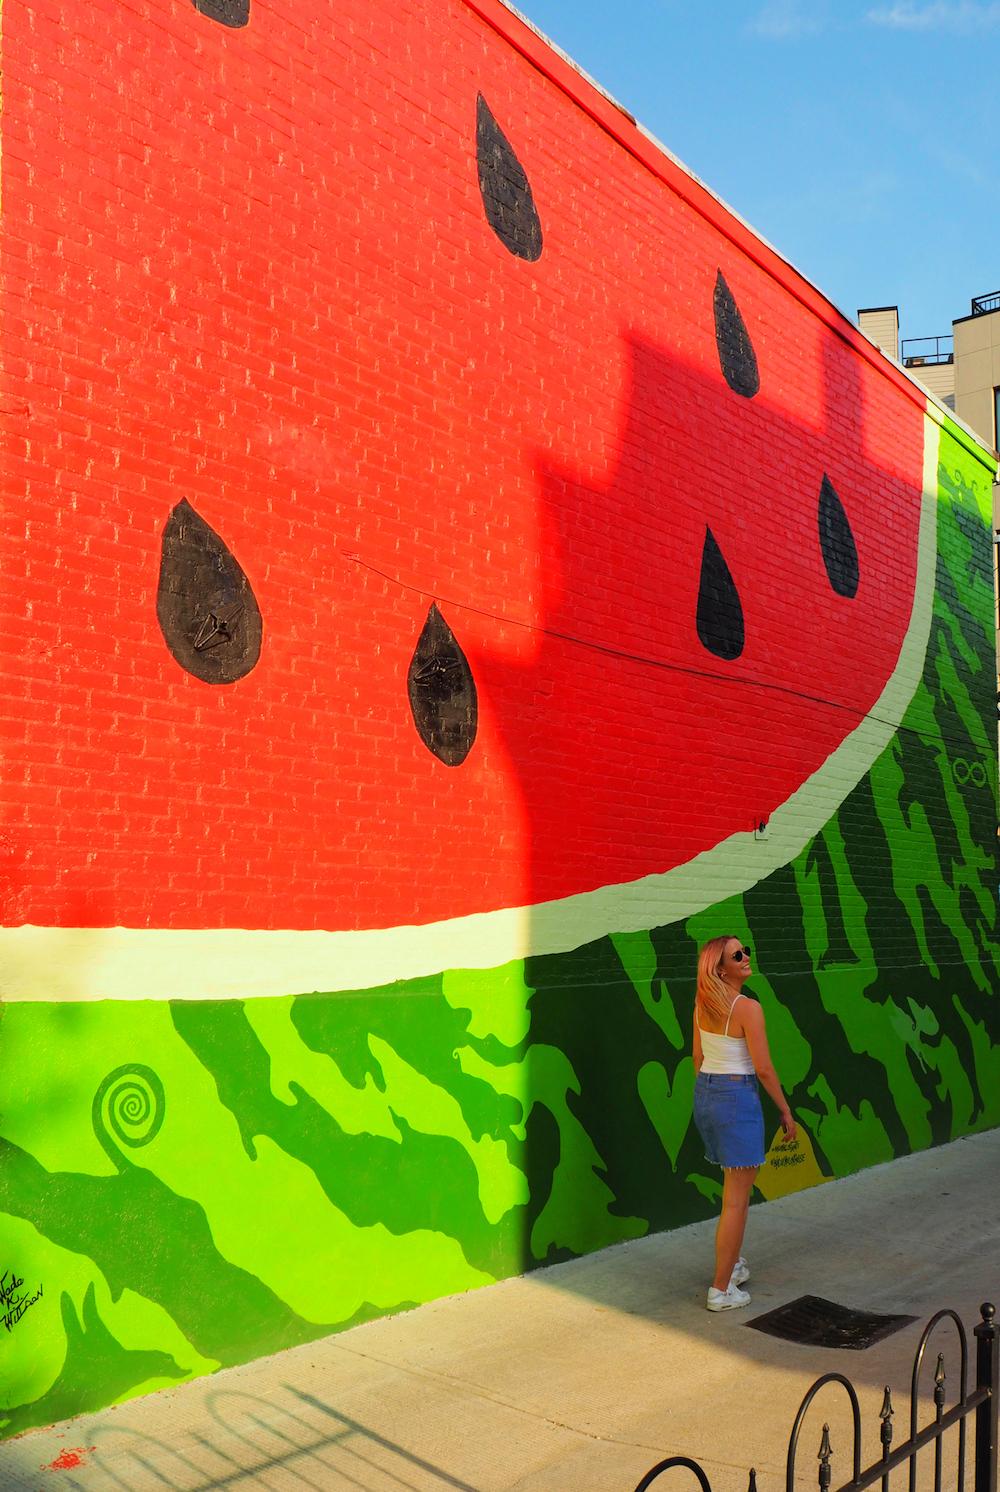 The Watermelon House, Washington D.C.